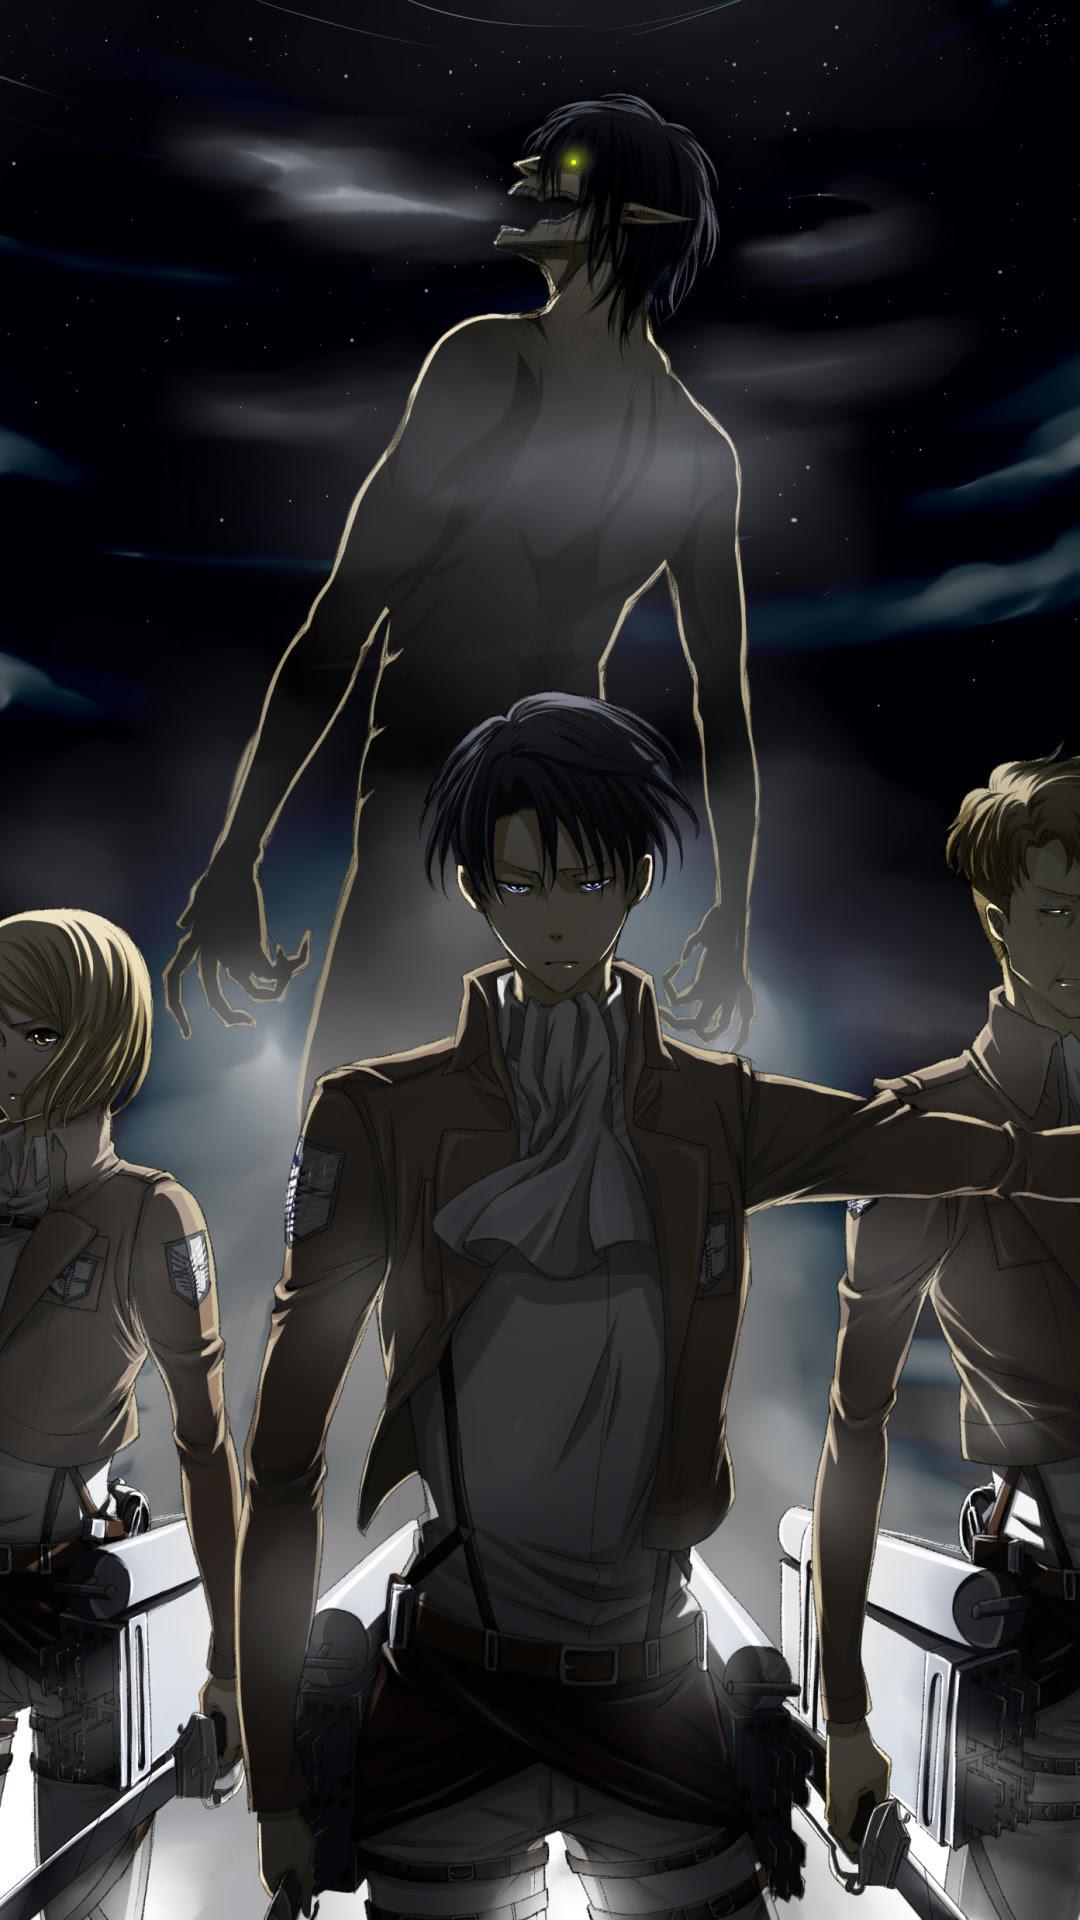 Aesthetic Anime Wallpaper Attack On Titan